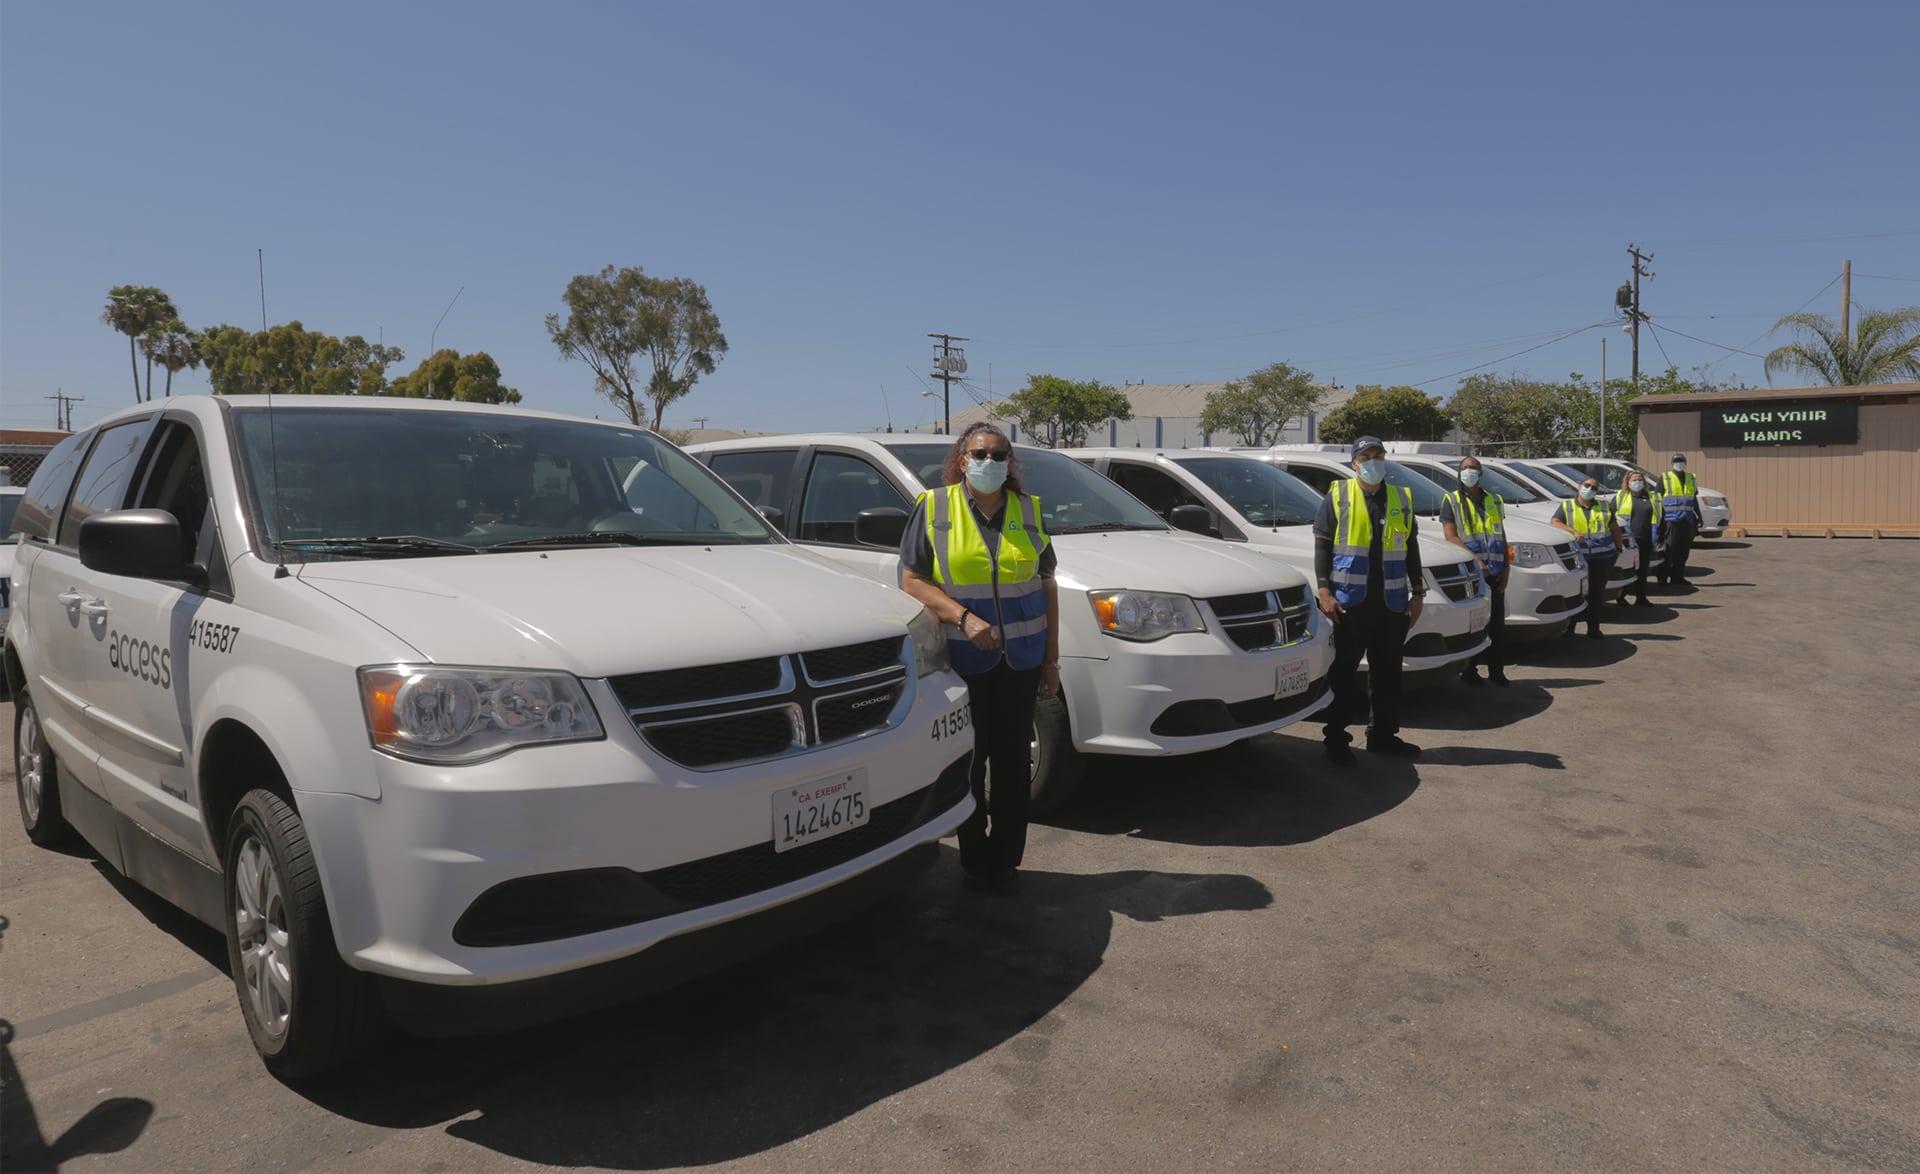 Global Paratransit Drivers Vehicles Parking Lot Global Paratransit